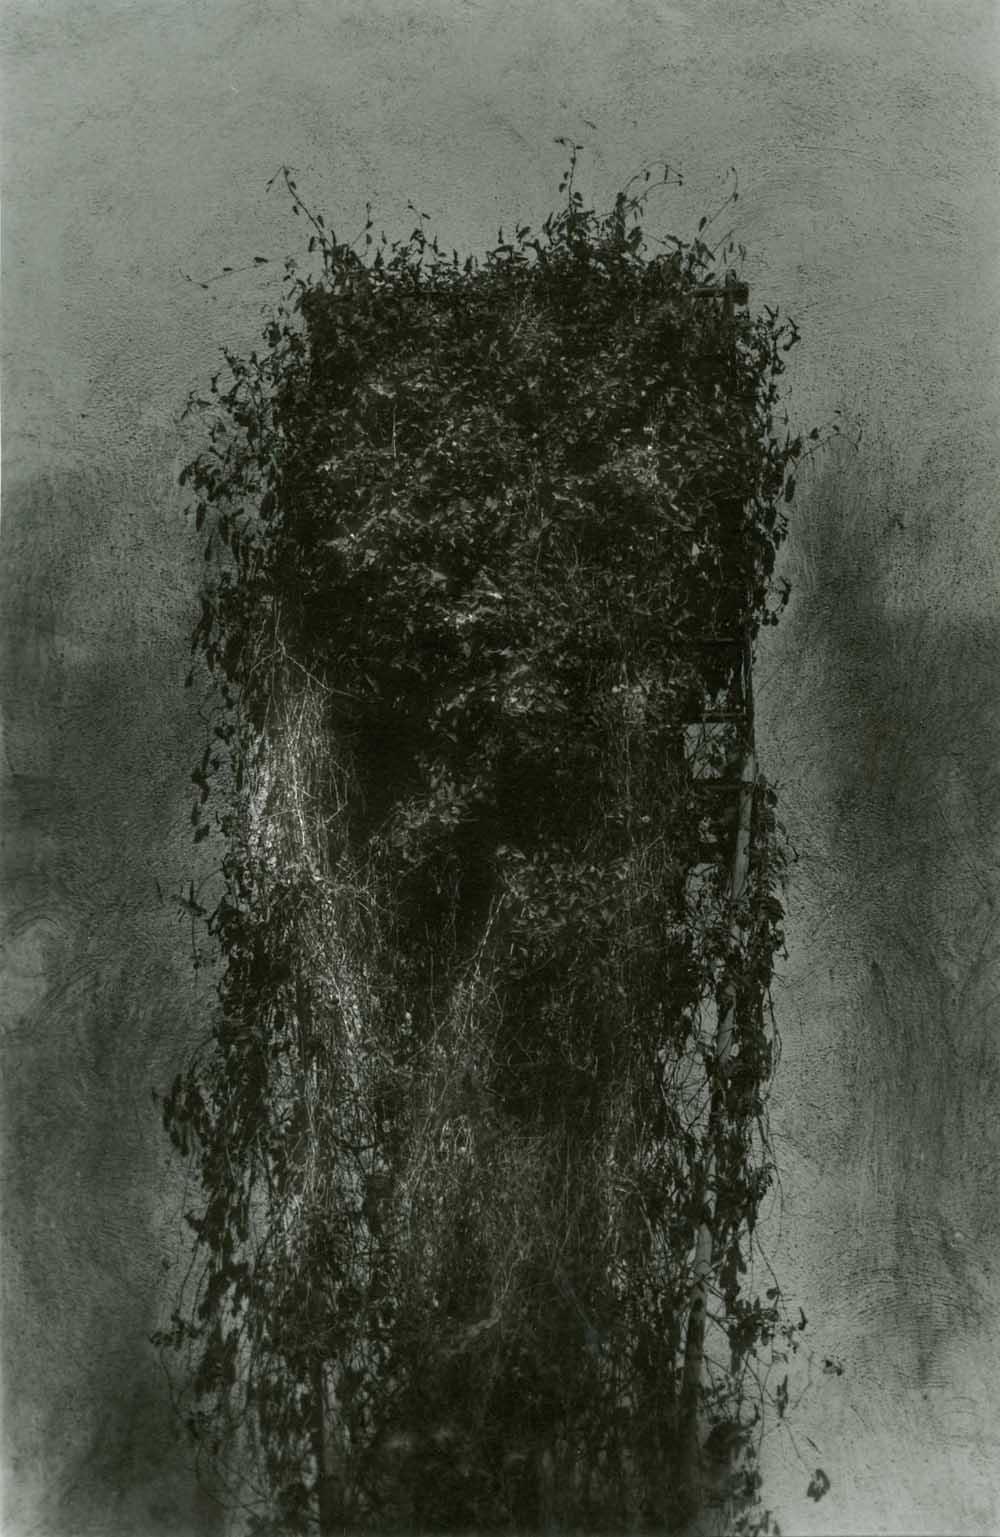 paola mongelli-rampicanti-07-1